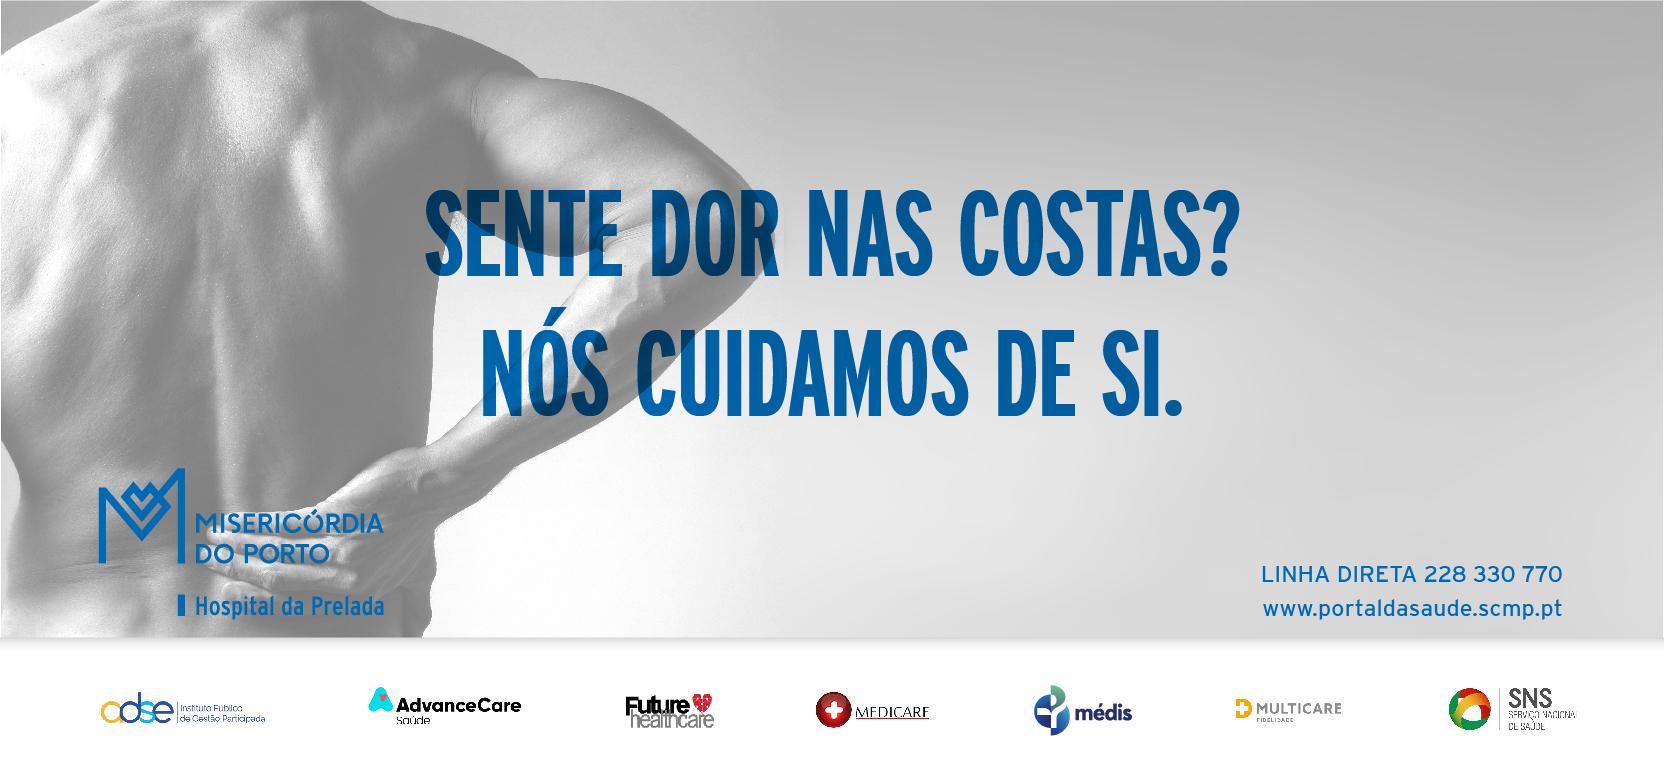 https://portaldasaude.scmp.pt/assets/misc/img/especialidades/Ortopedia/MP%20HP%20bannersite%20mundiais.jpg